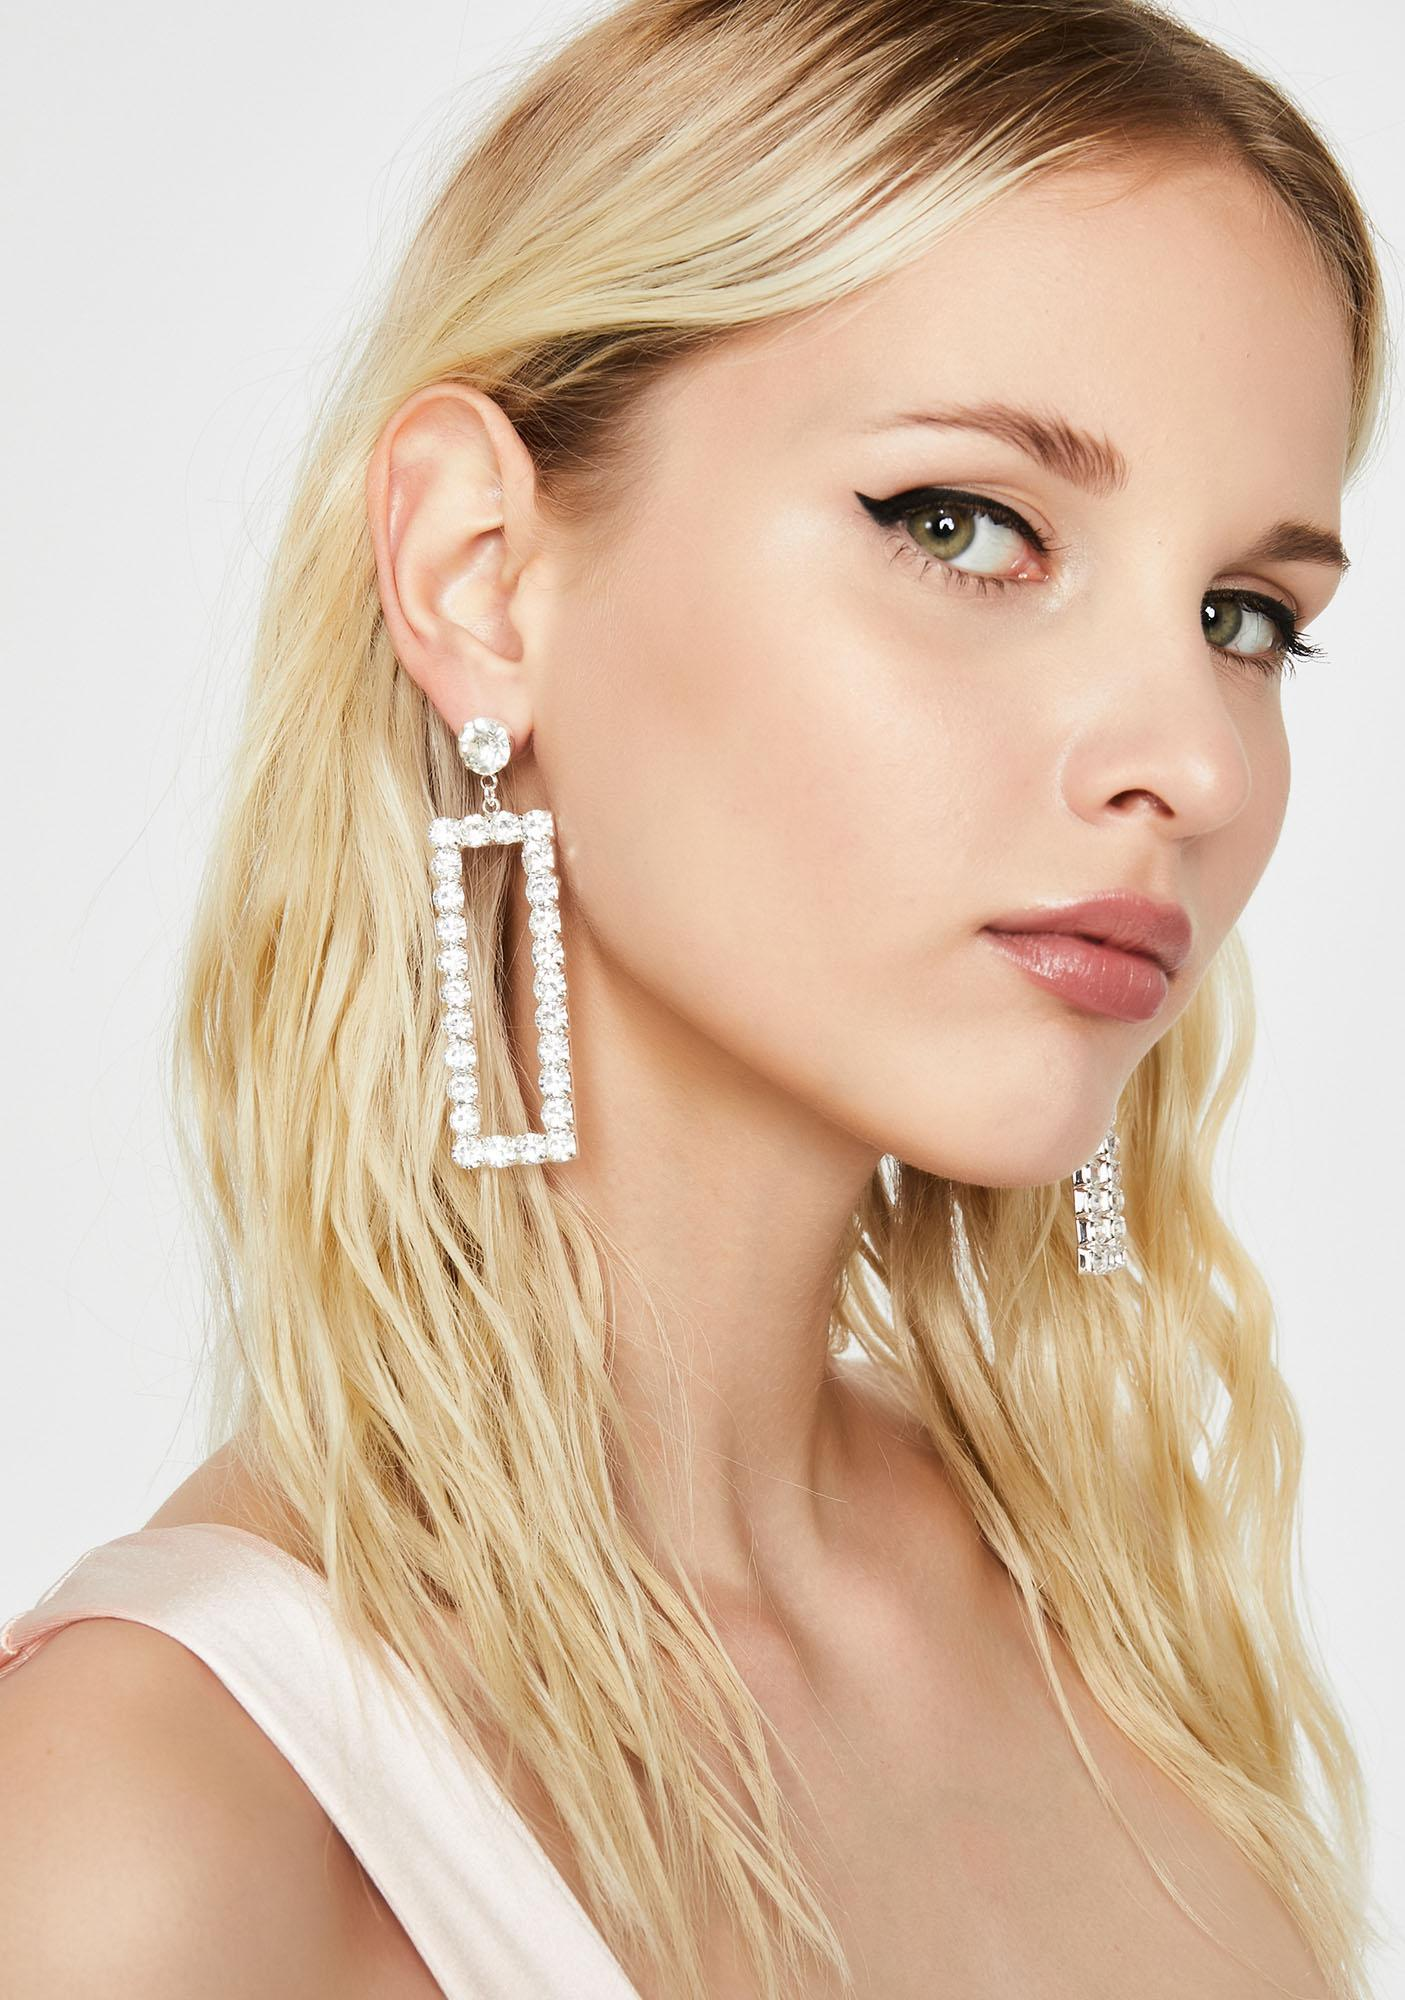 Angelic Angles Rhinestone Earrings